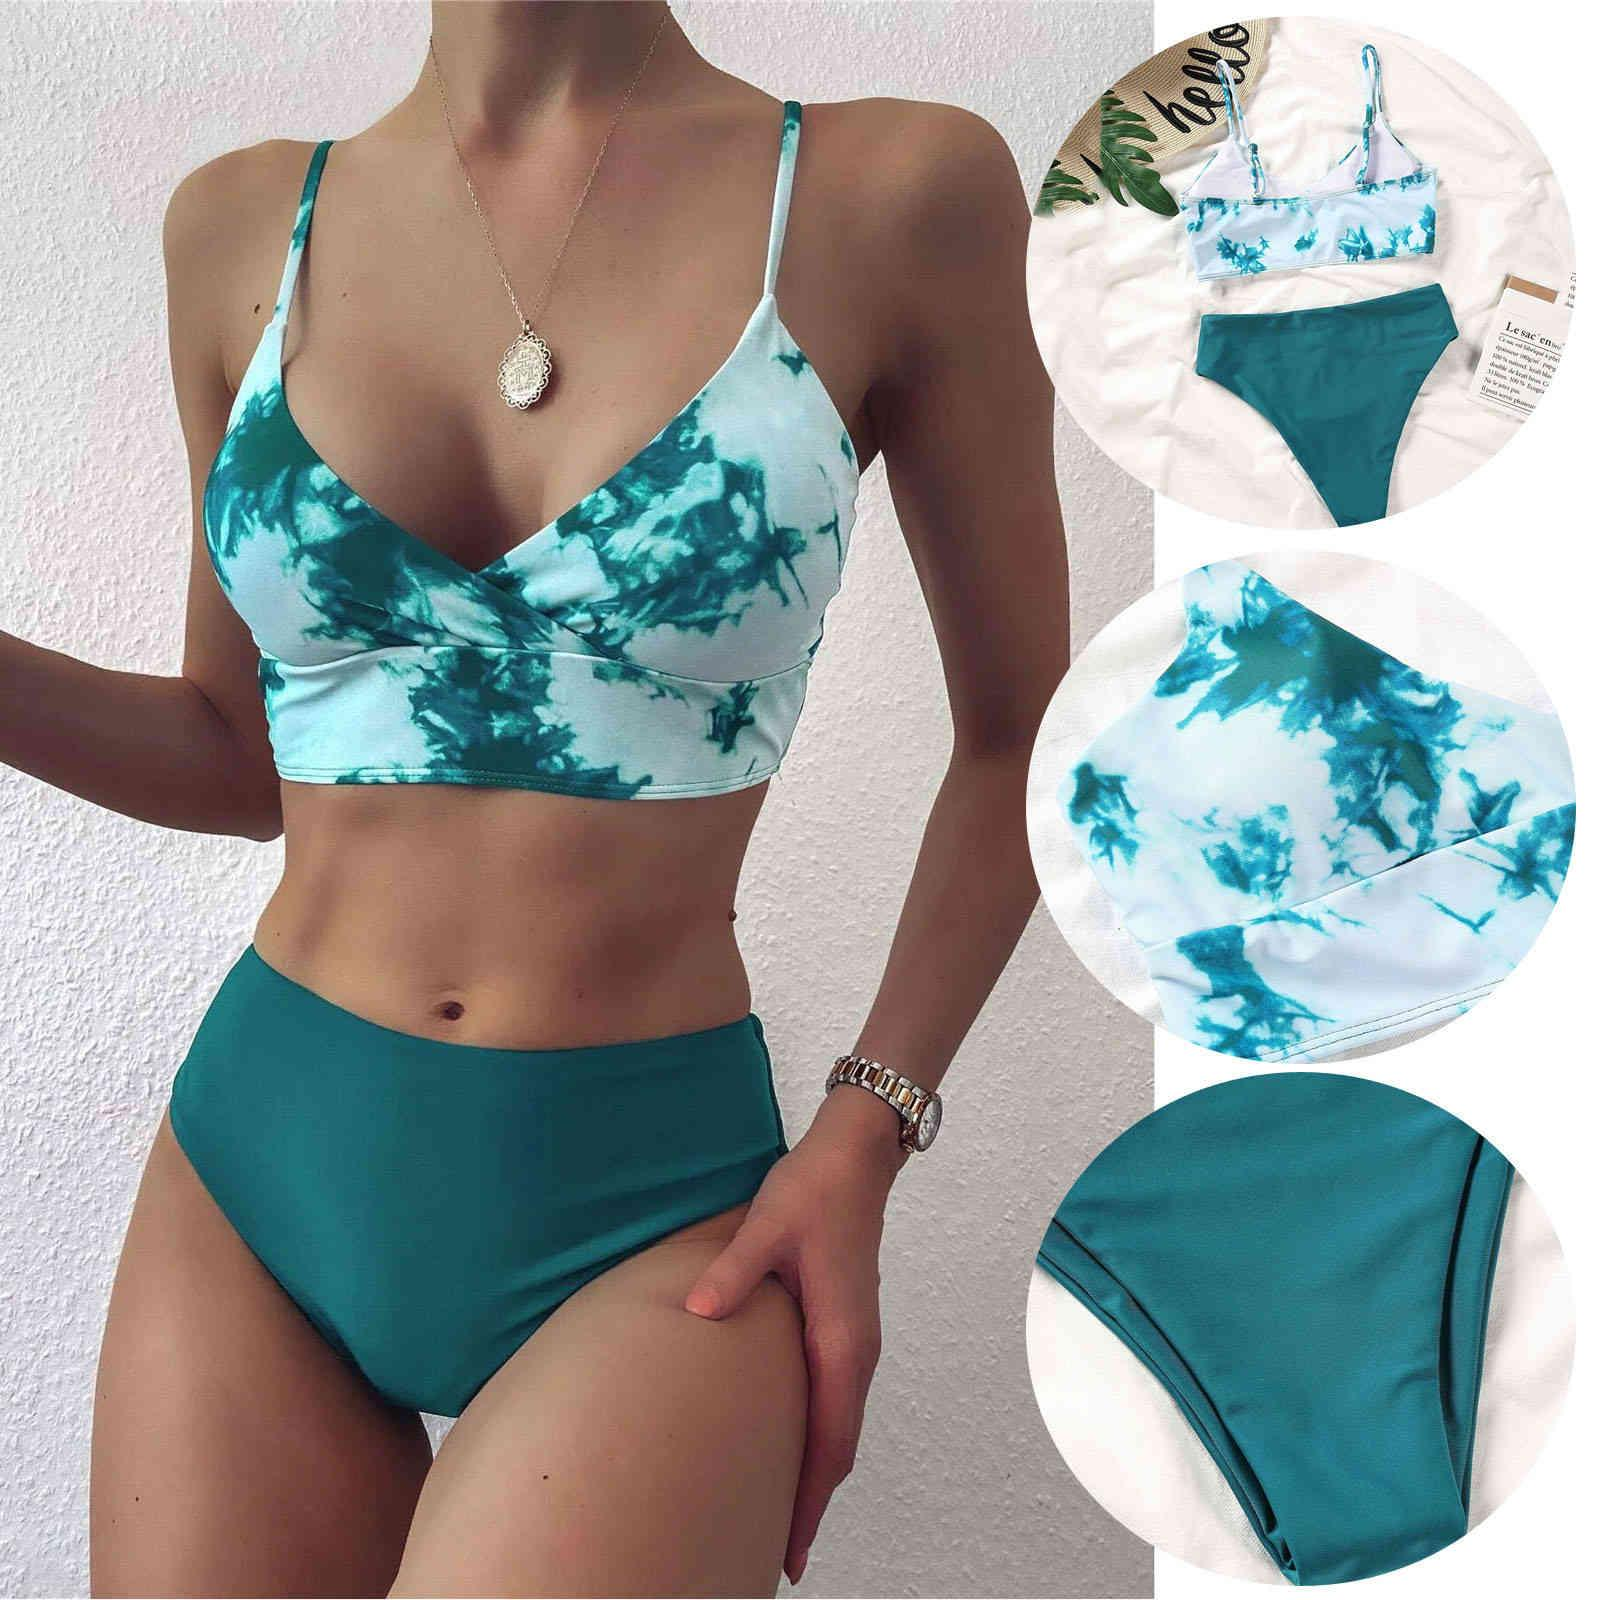 Moda Mulheres Bandeau Bandau Bandage Bikini Set Push-up Brasileira Badmode Tie-Dye Imprimir Beachwear Badsuit High Wist